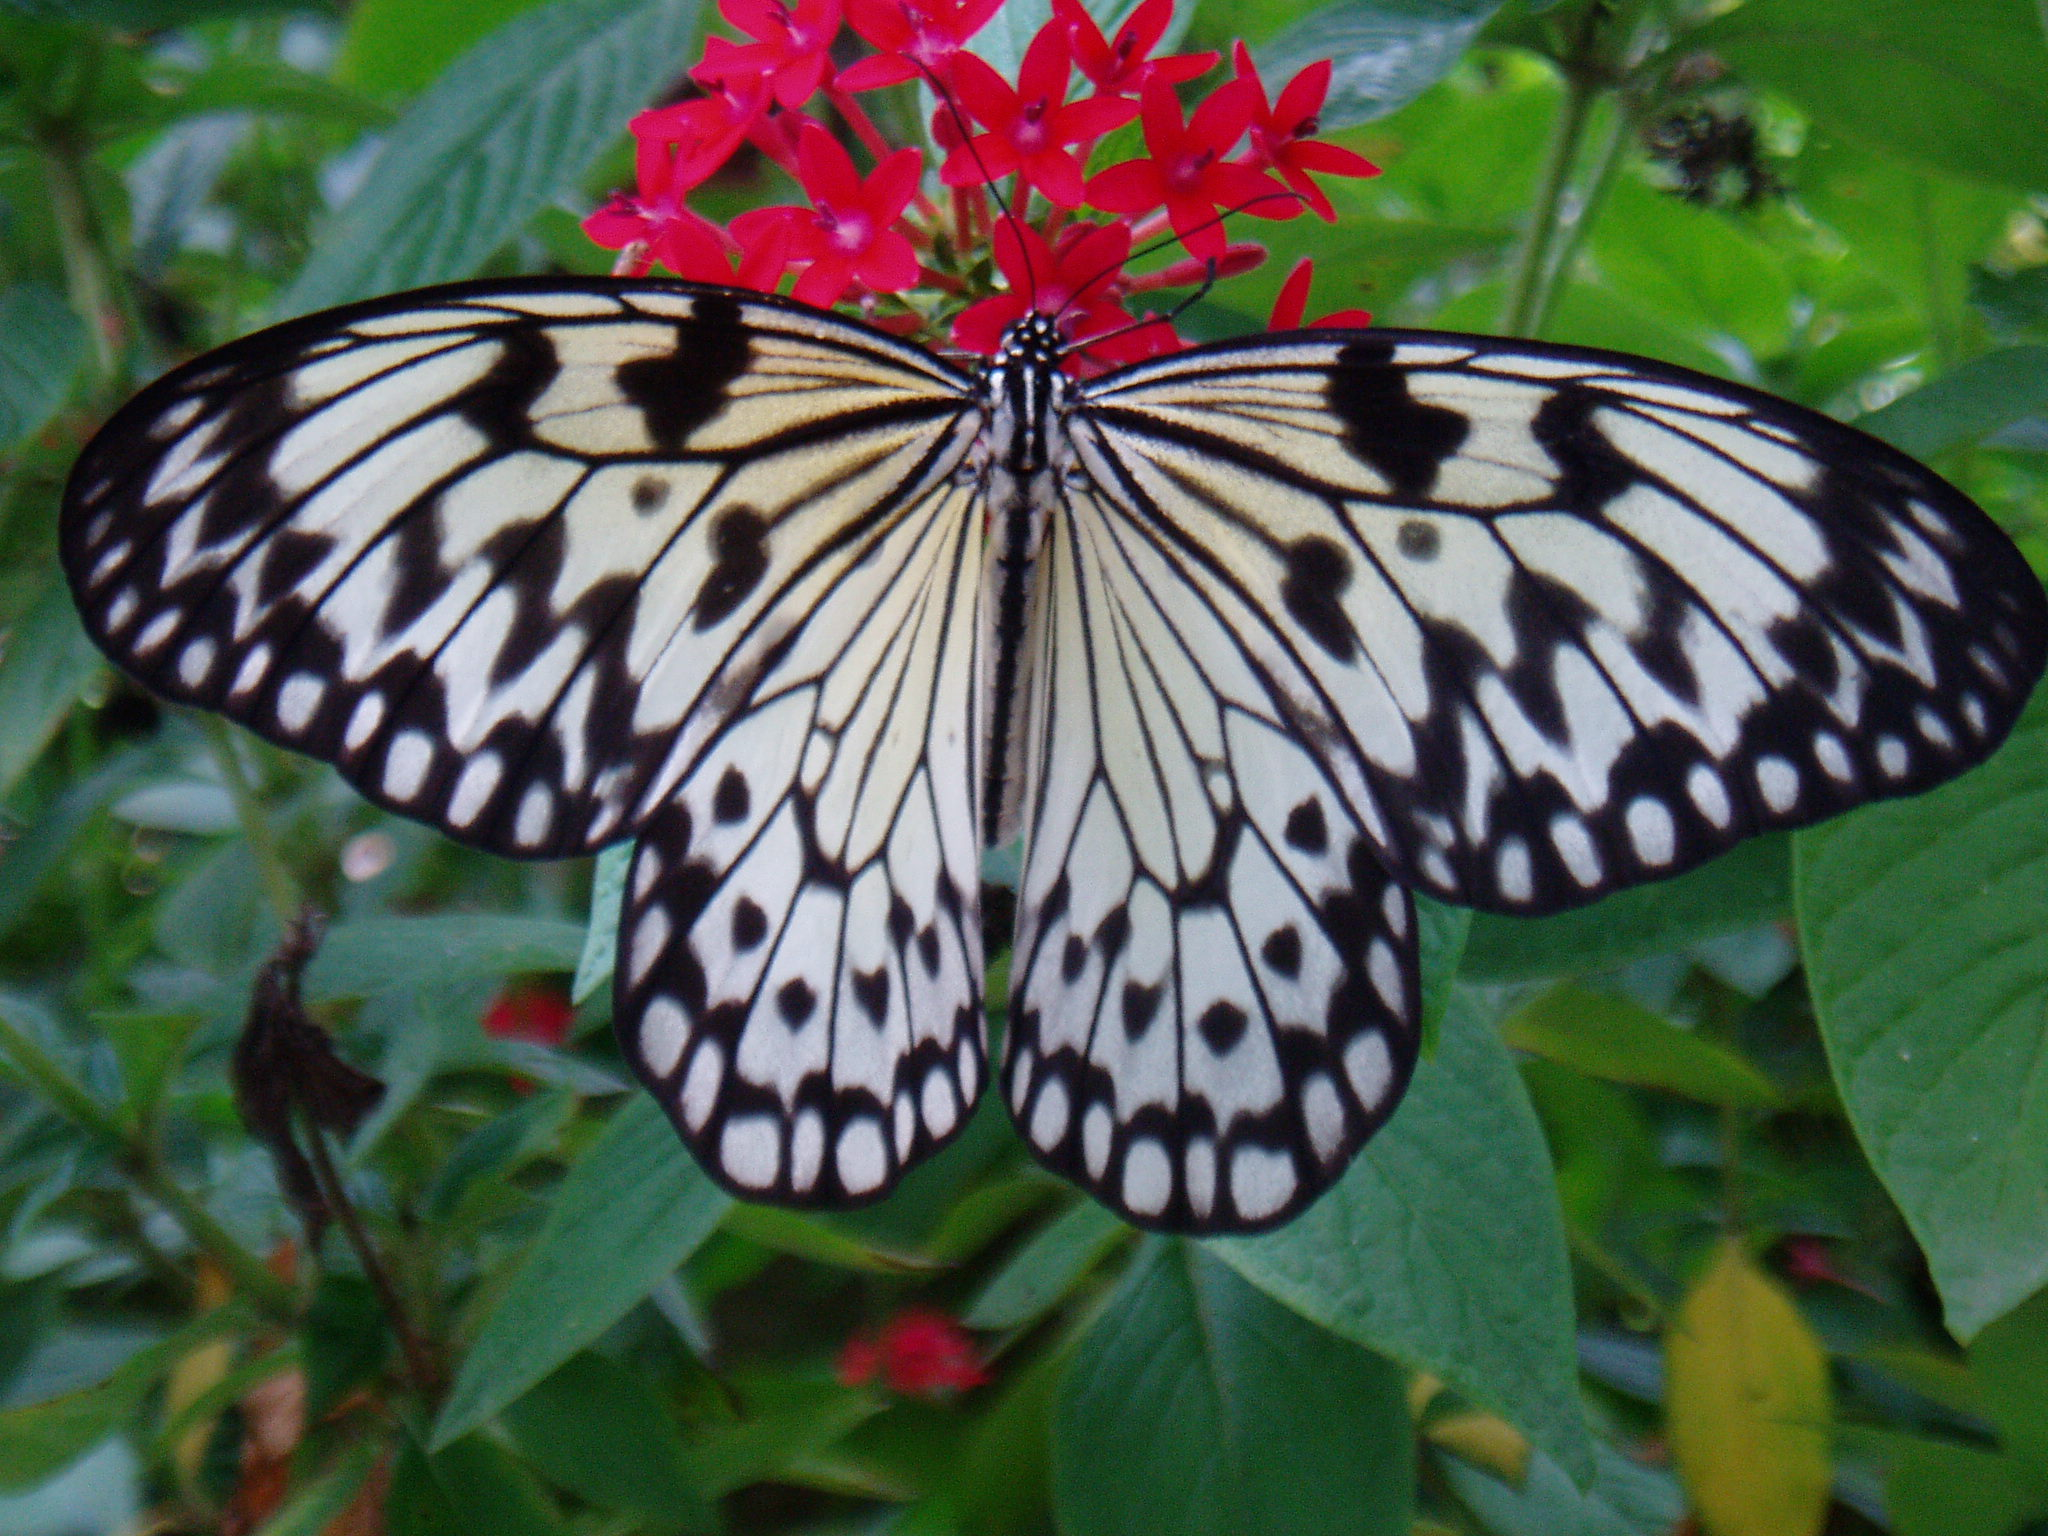 File:Idea Leuconoe (Paper Kite).jpg - Wikimedia Commons